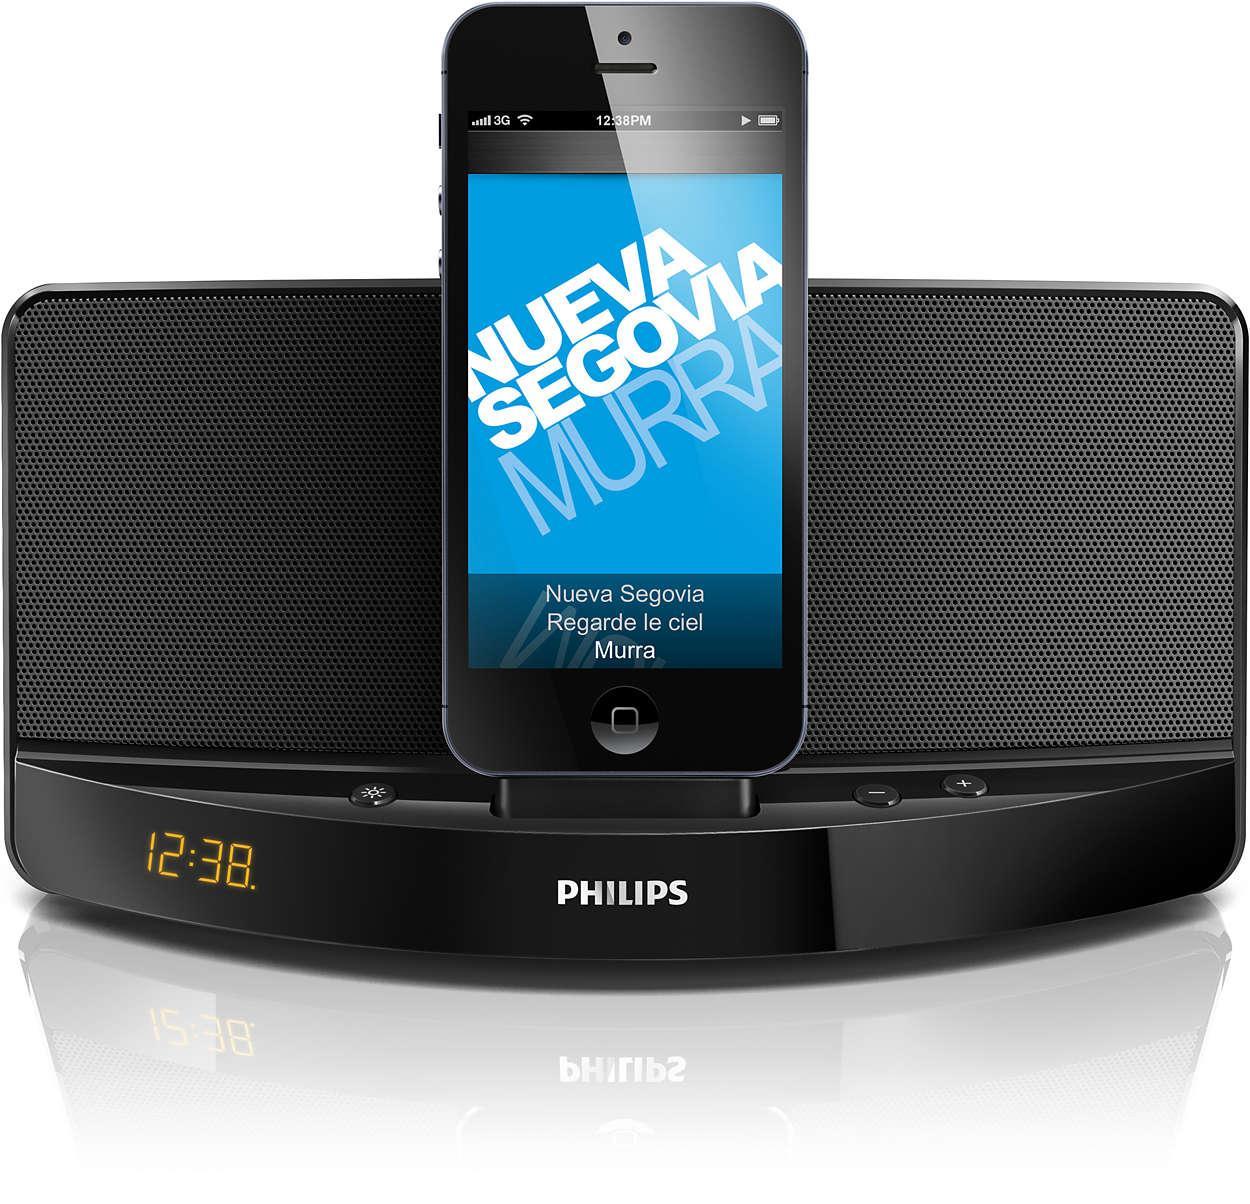 Iphone Car Docking Station Reviews